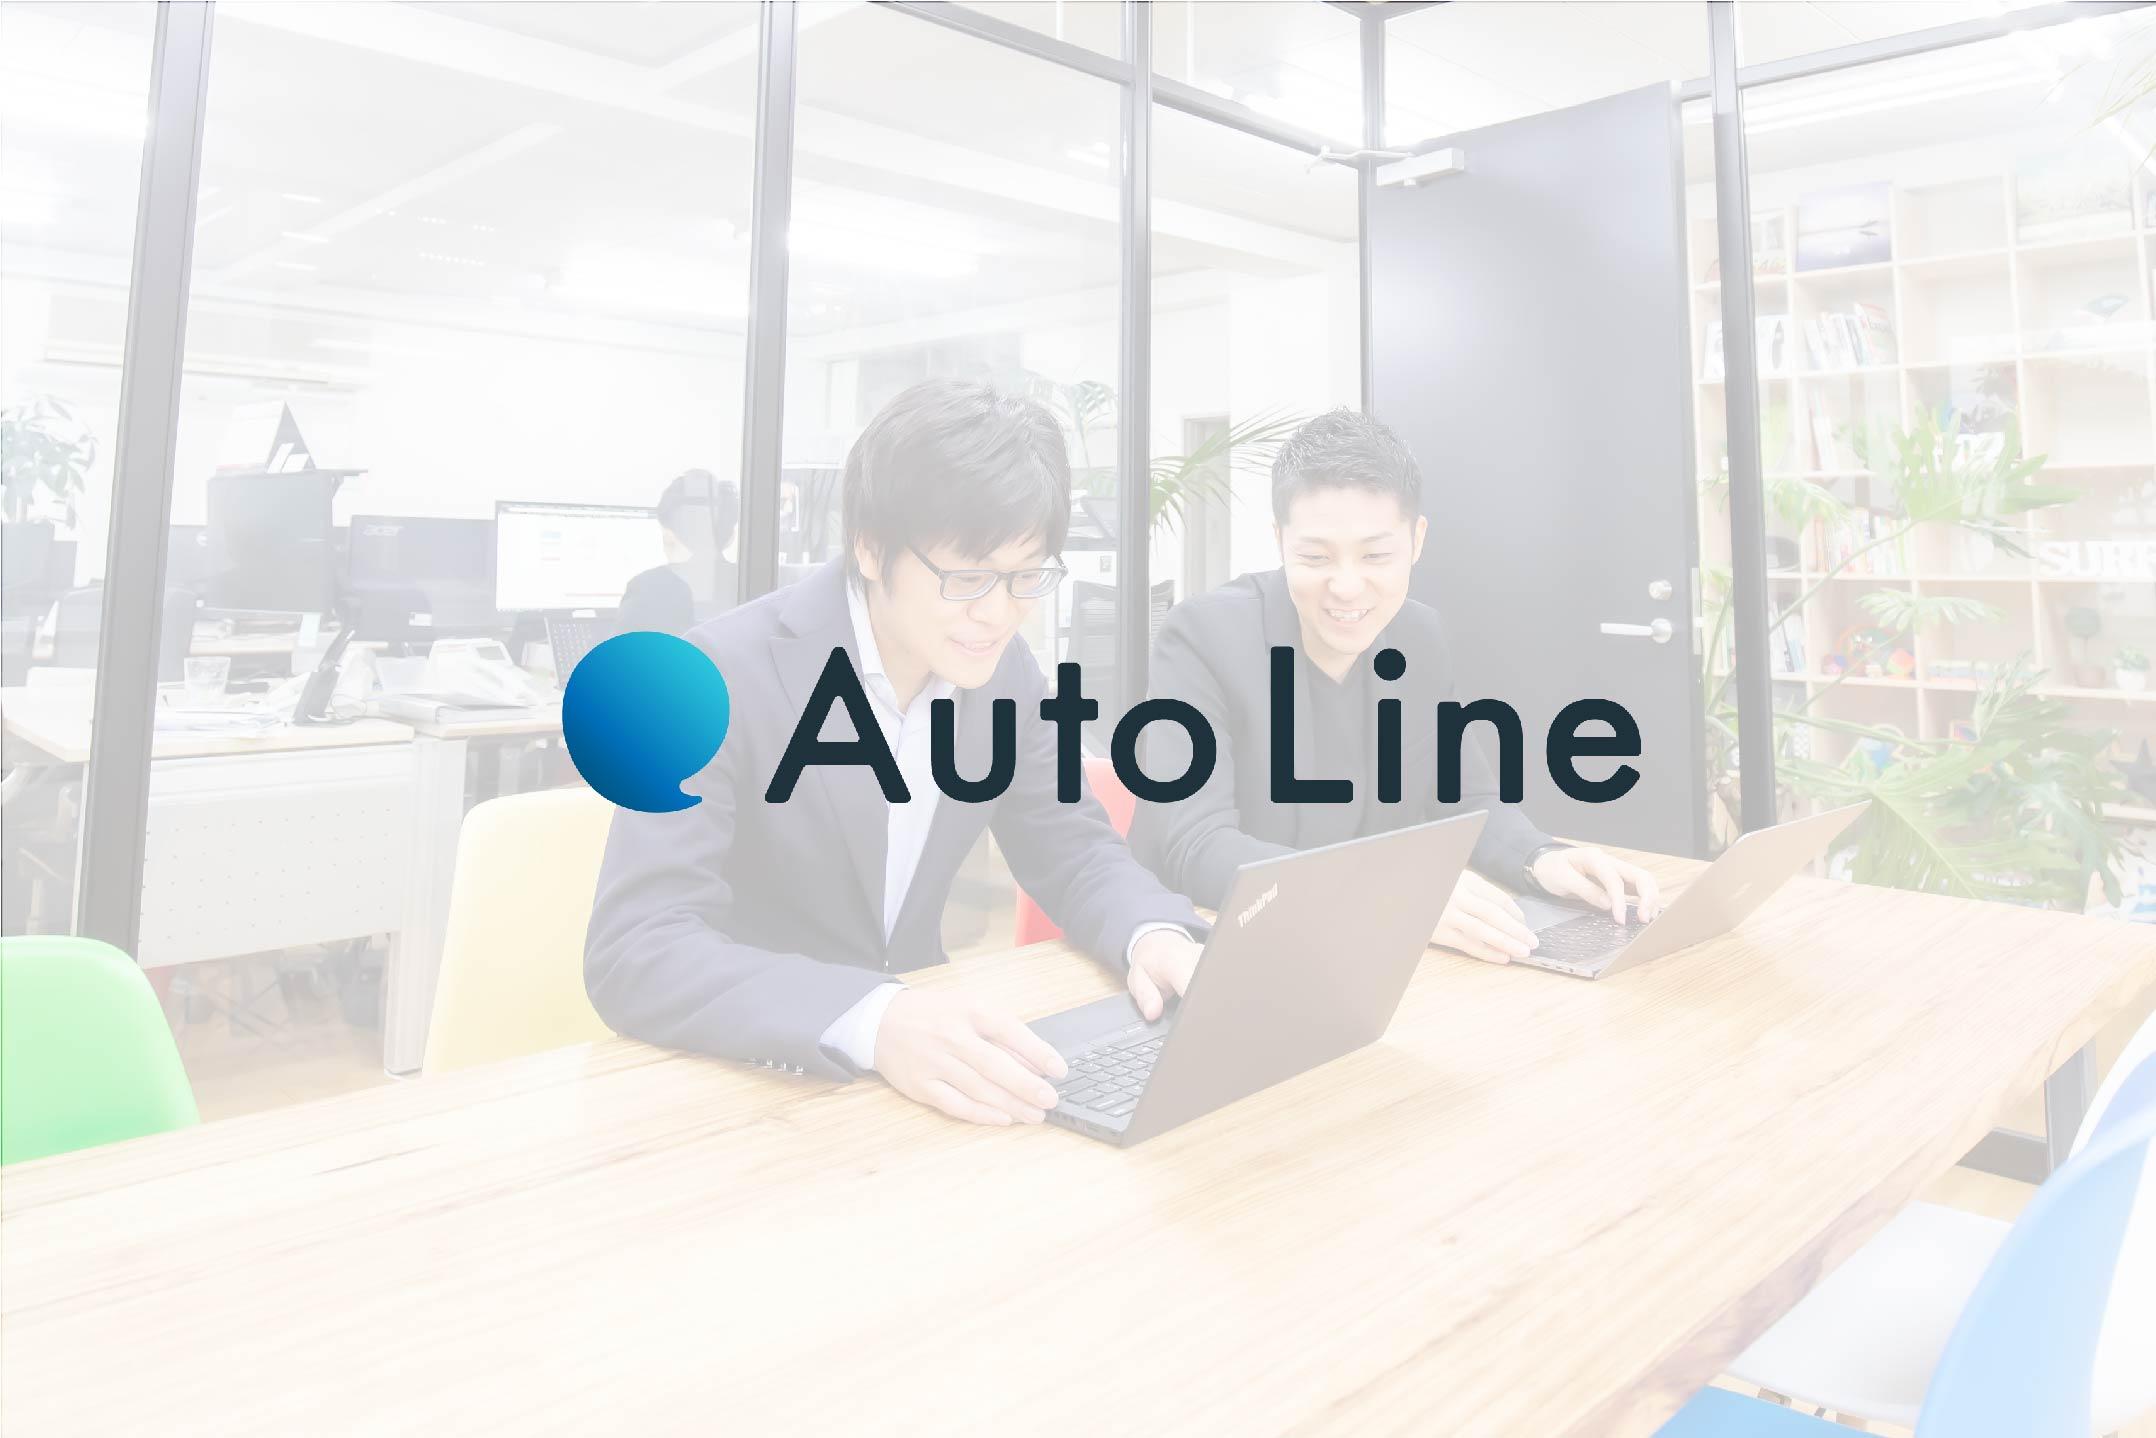 UI/UXデザイナー(AutoLine事業)